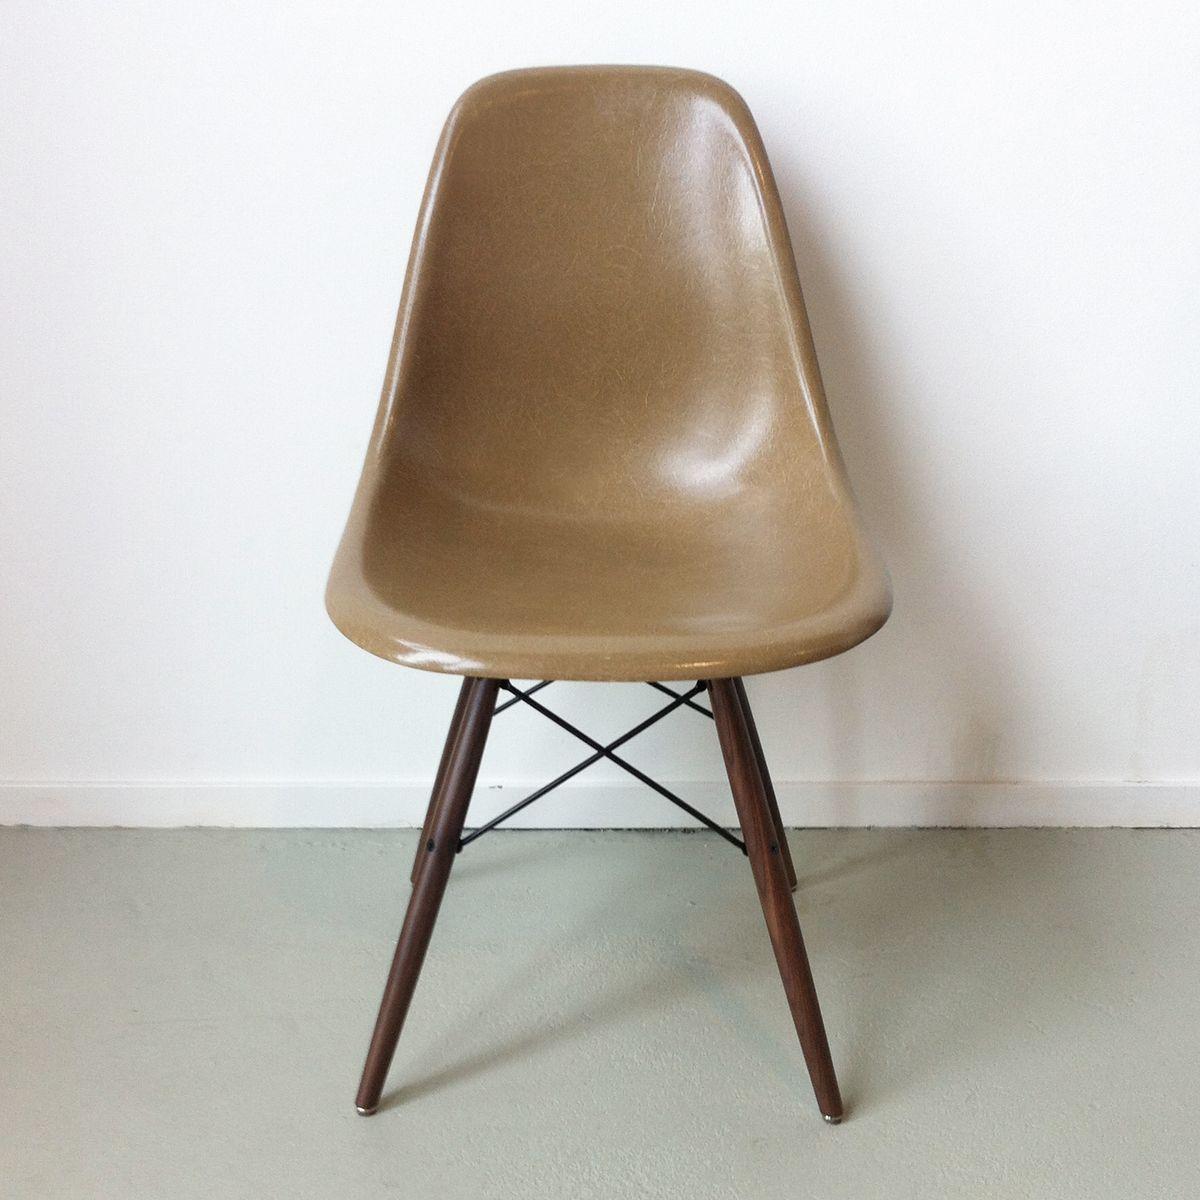 hellbrauner dsw stuhl von charles ray eames f r herman. Black Bedroom Furniture Sets. Home Design Ideas